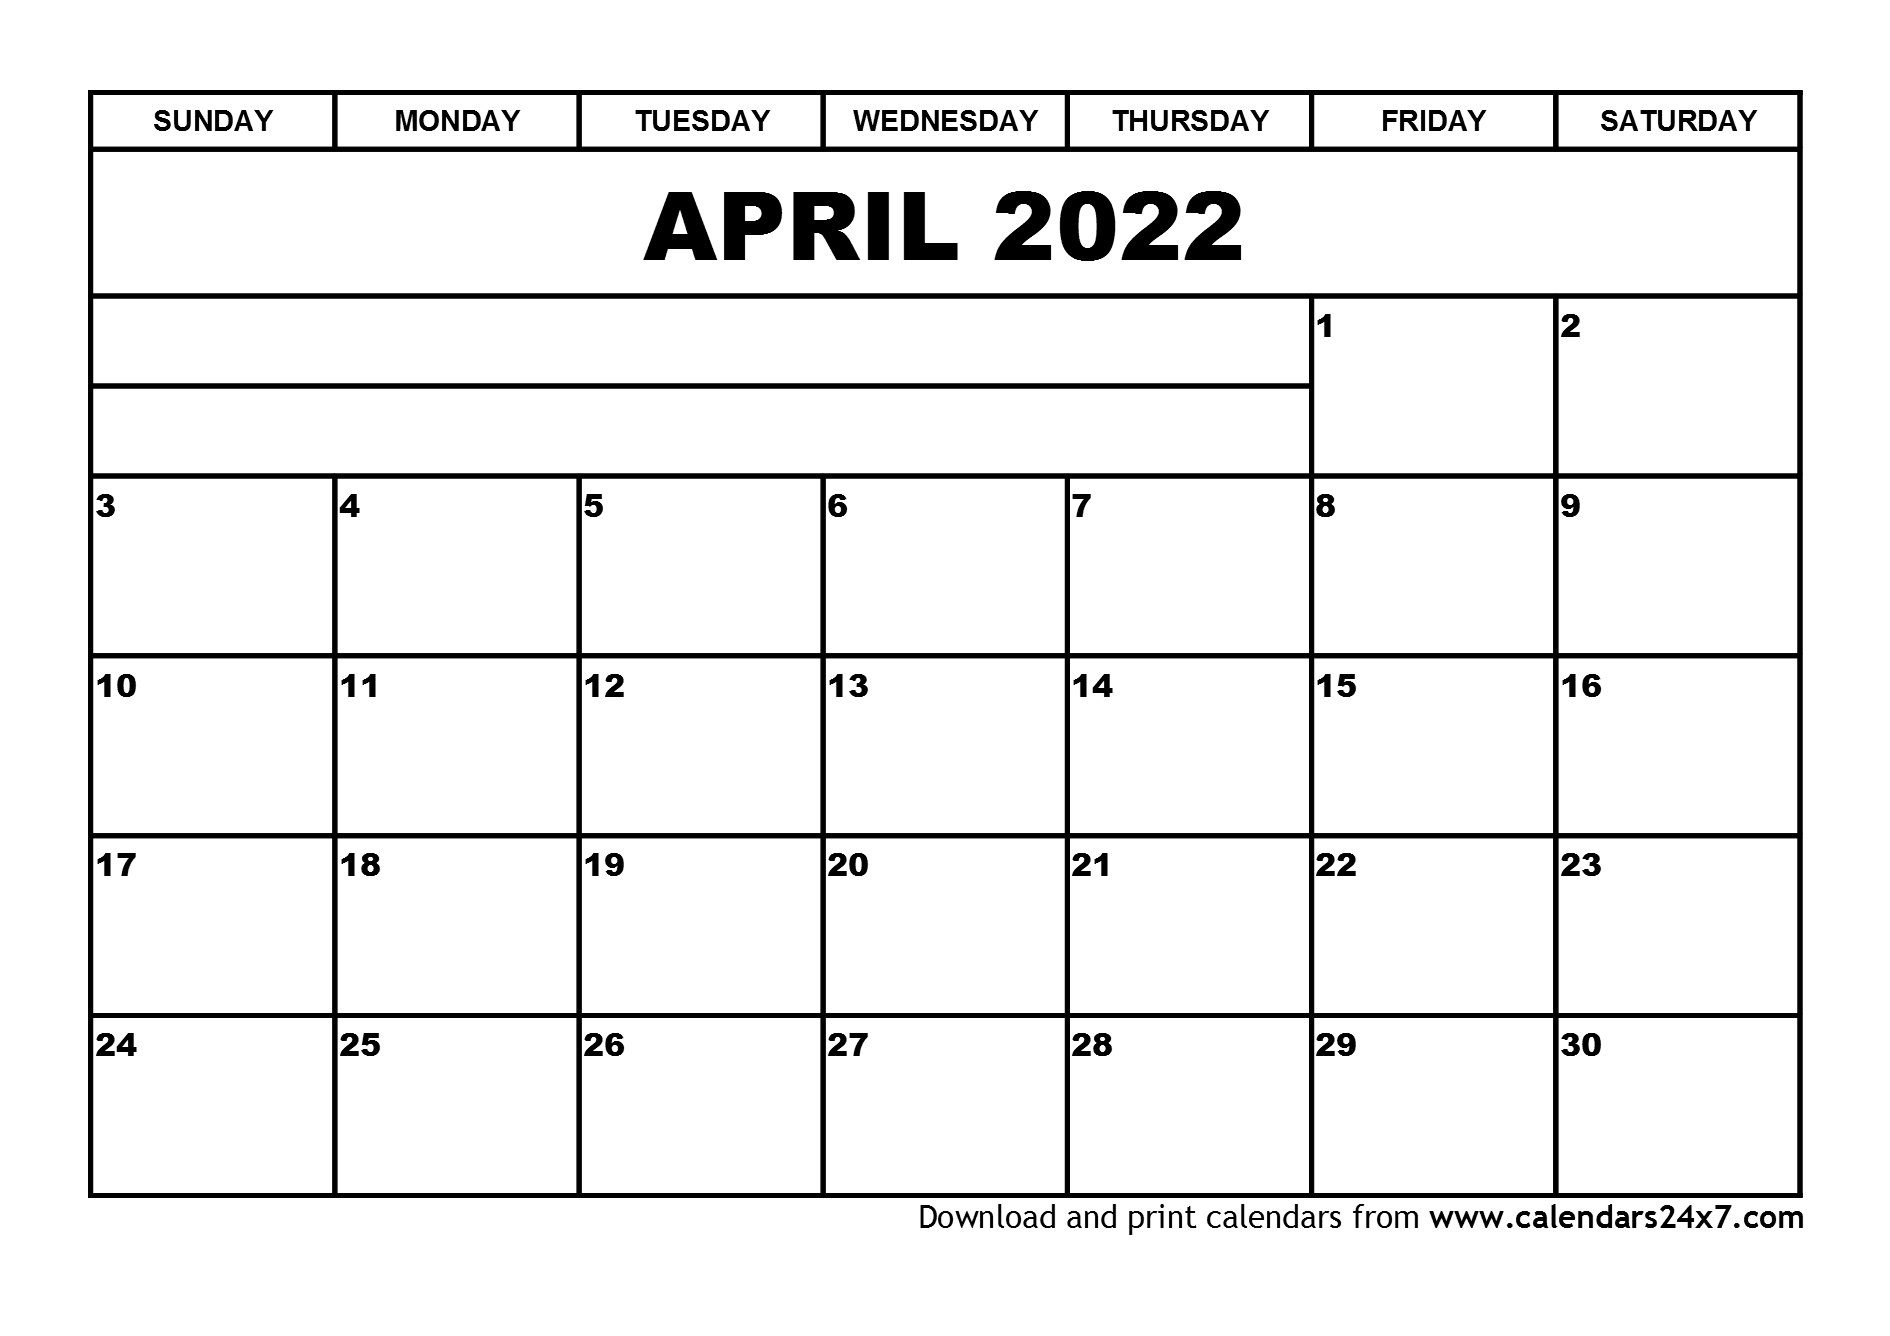 April 2022 Calendar & May 2022 Calendar Intended For 2022 Calendar Feb March April